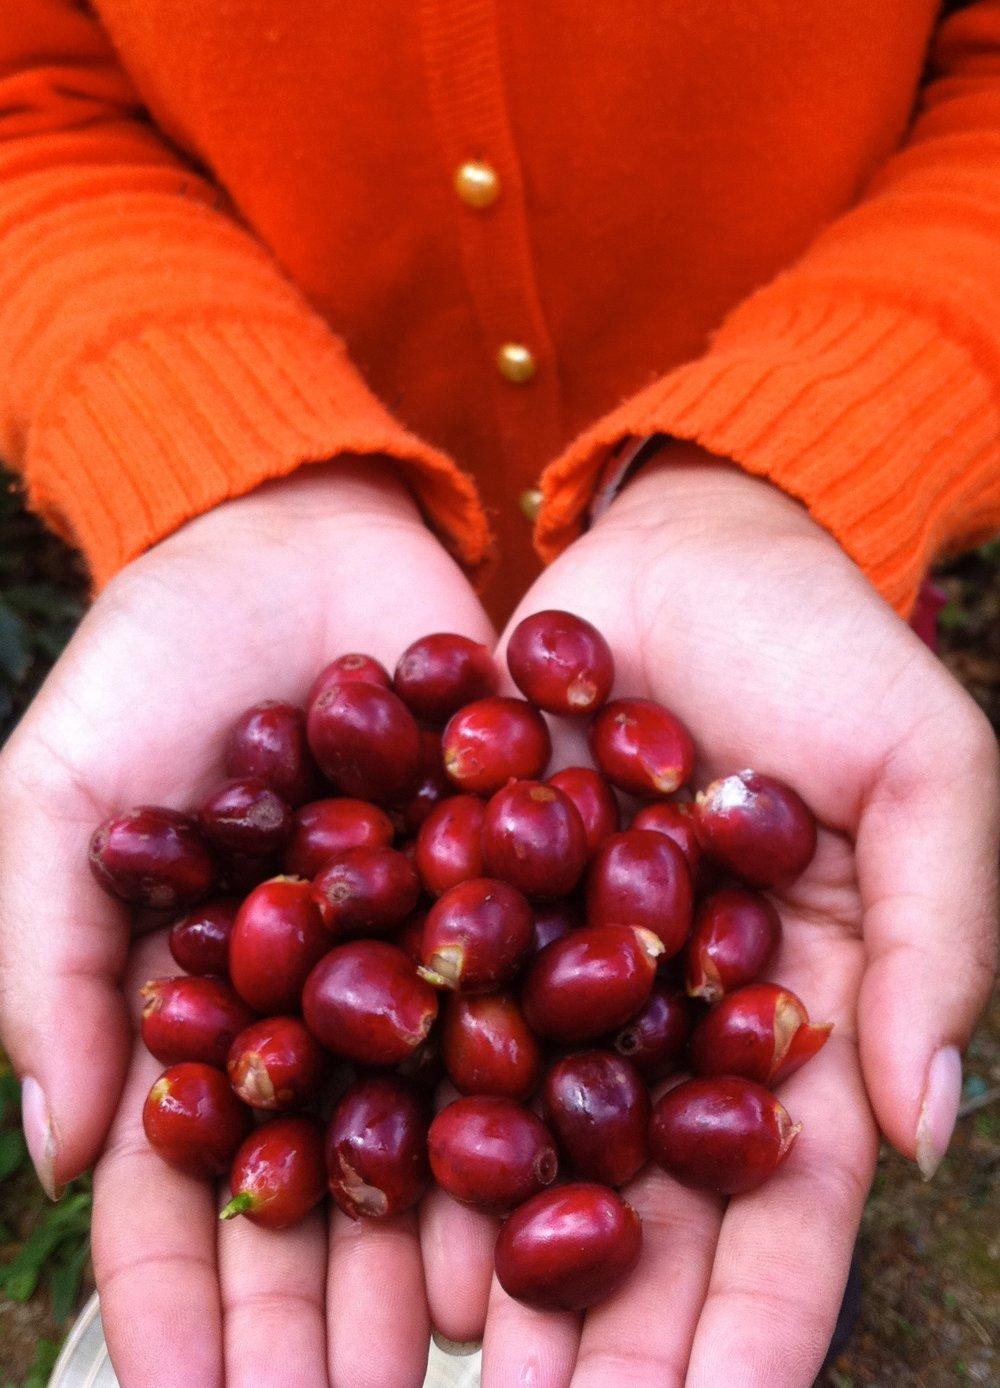 cherries2.jpg